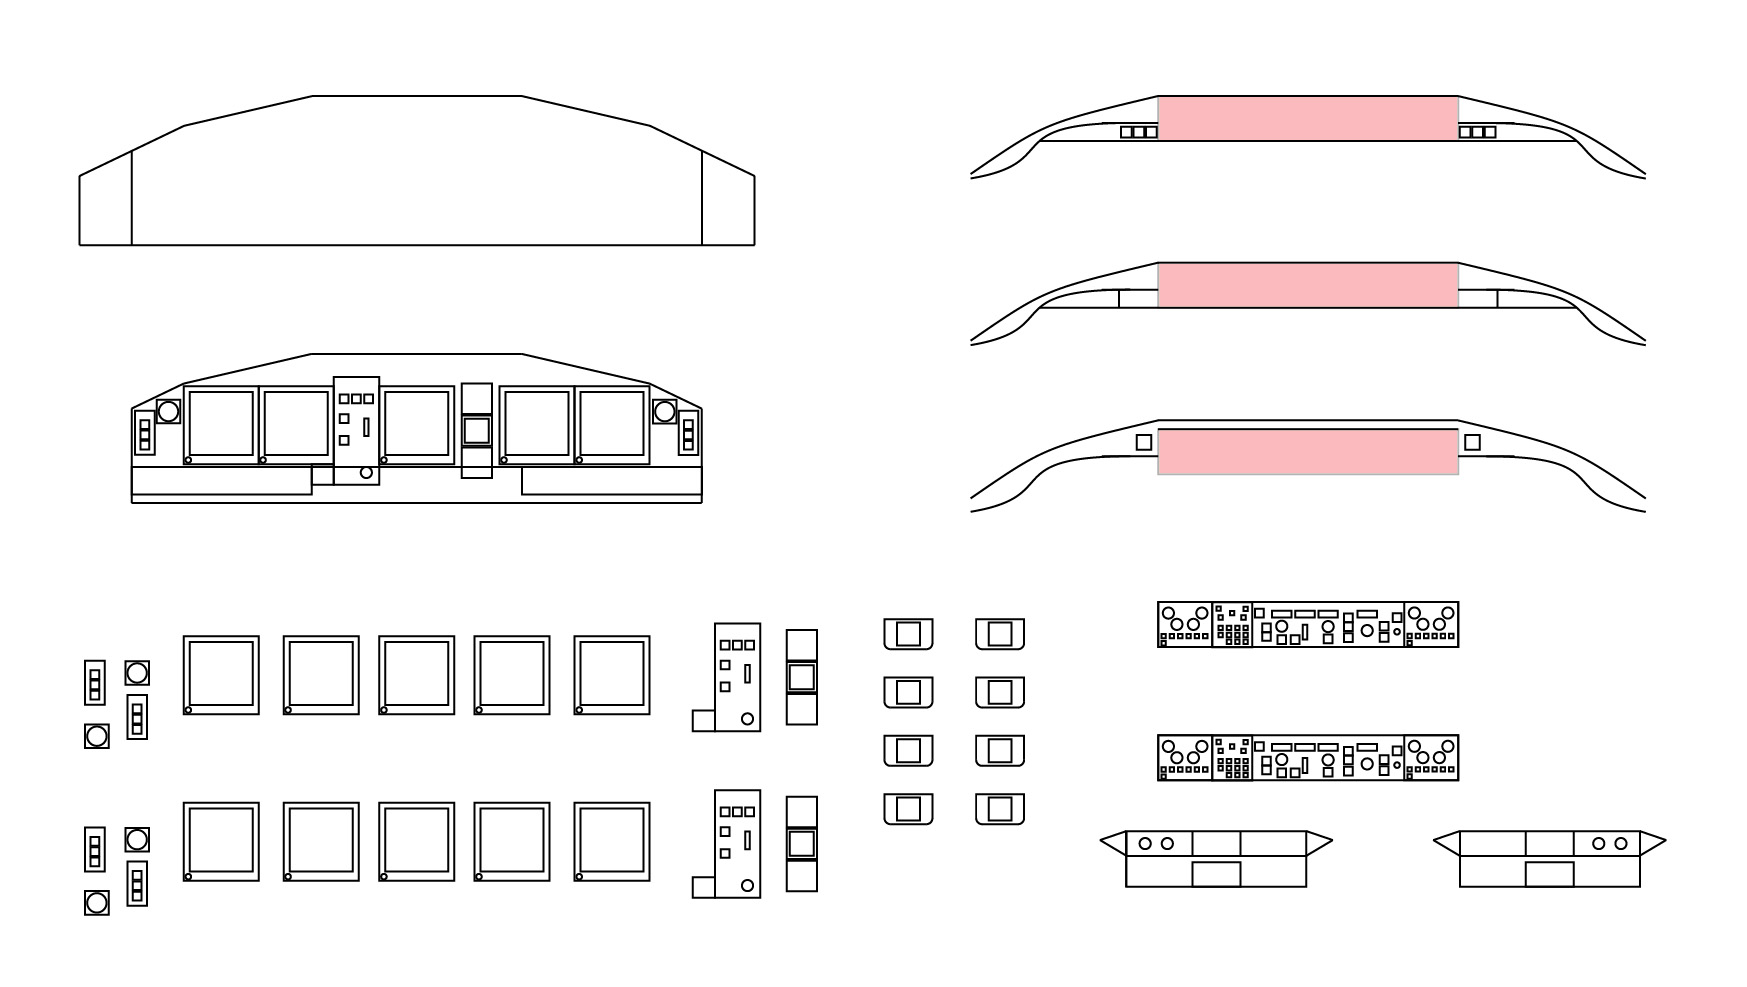 Cabin - cockpit - drawings 2.jpg